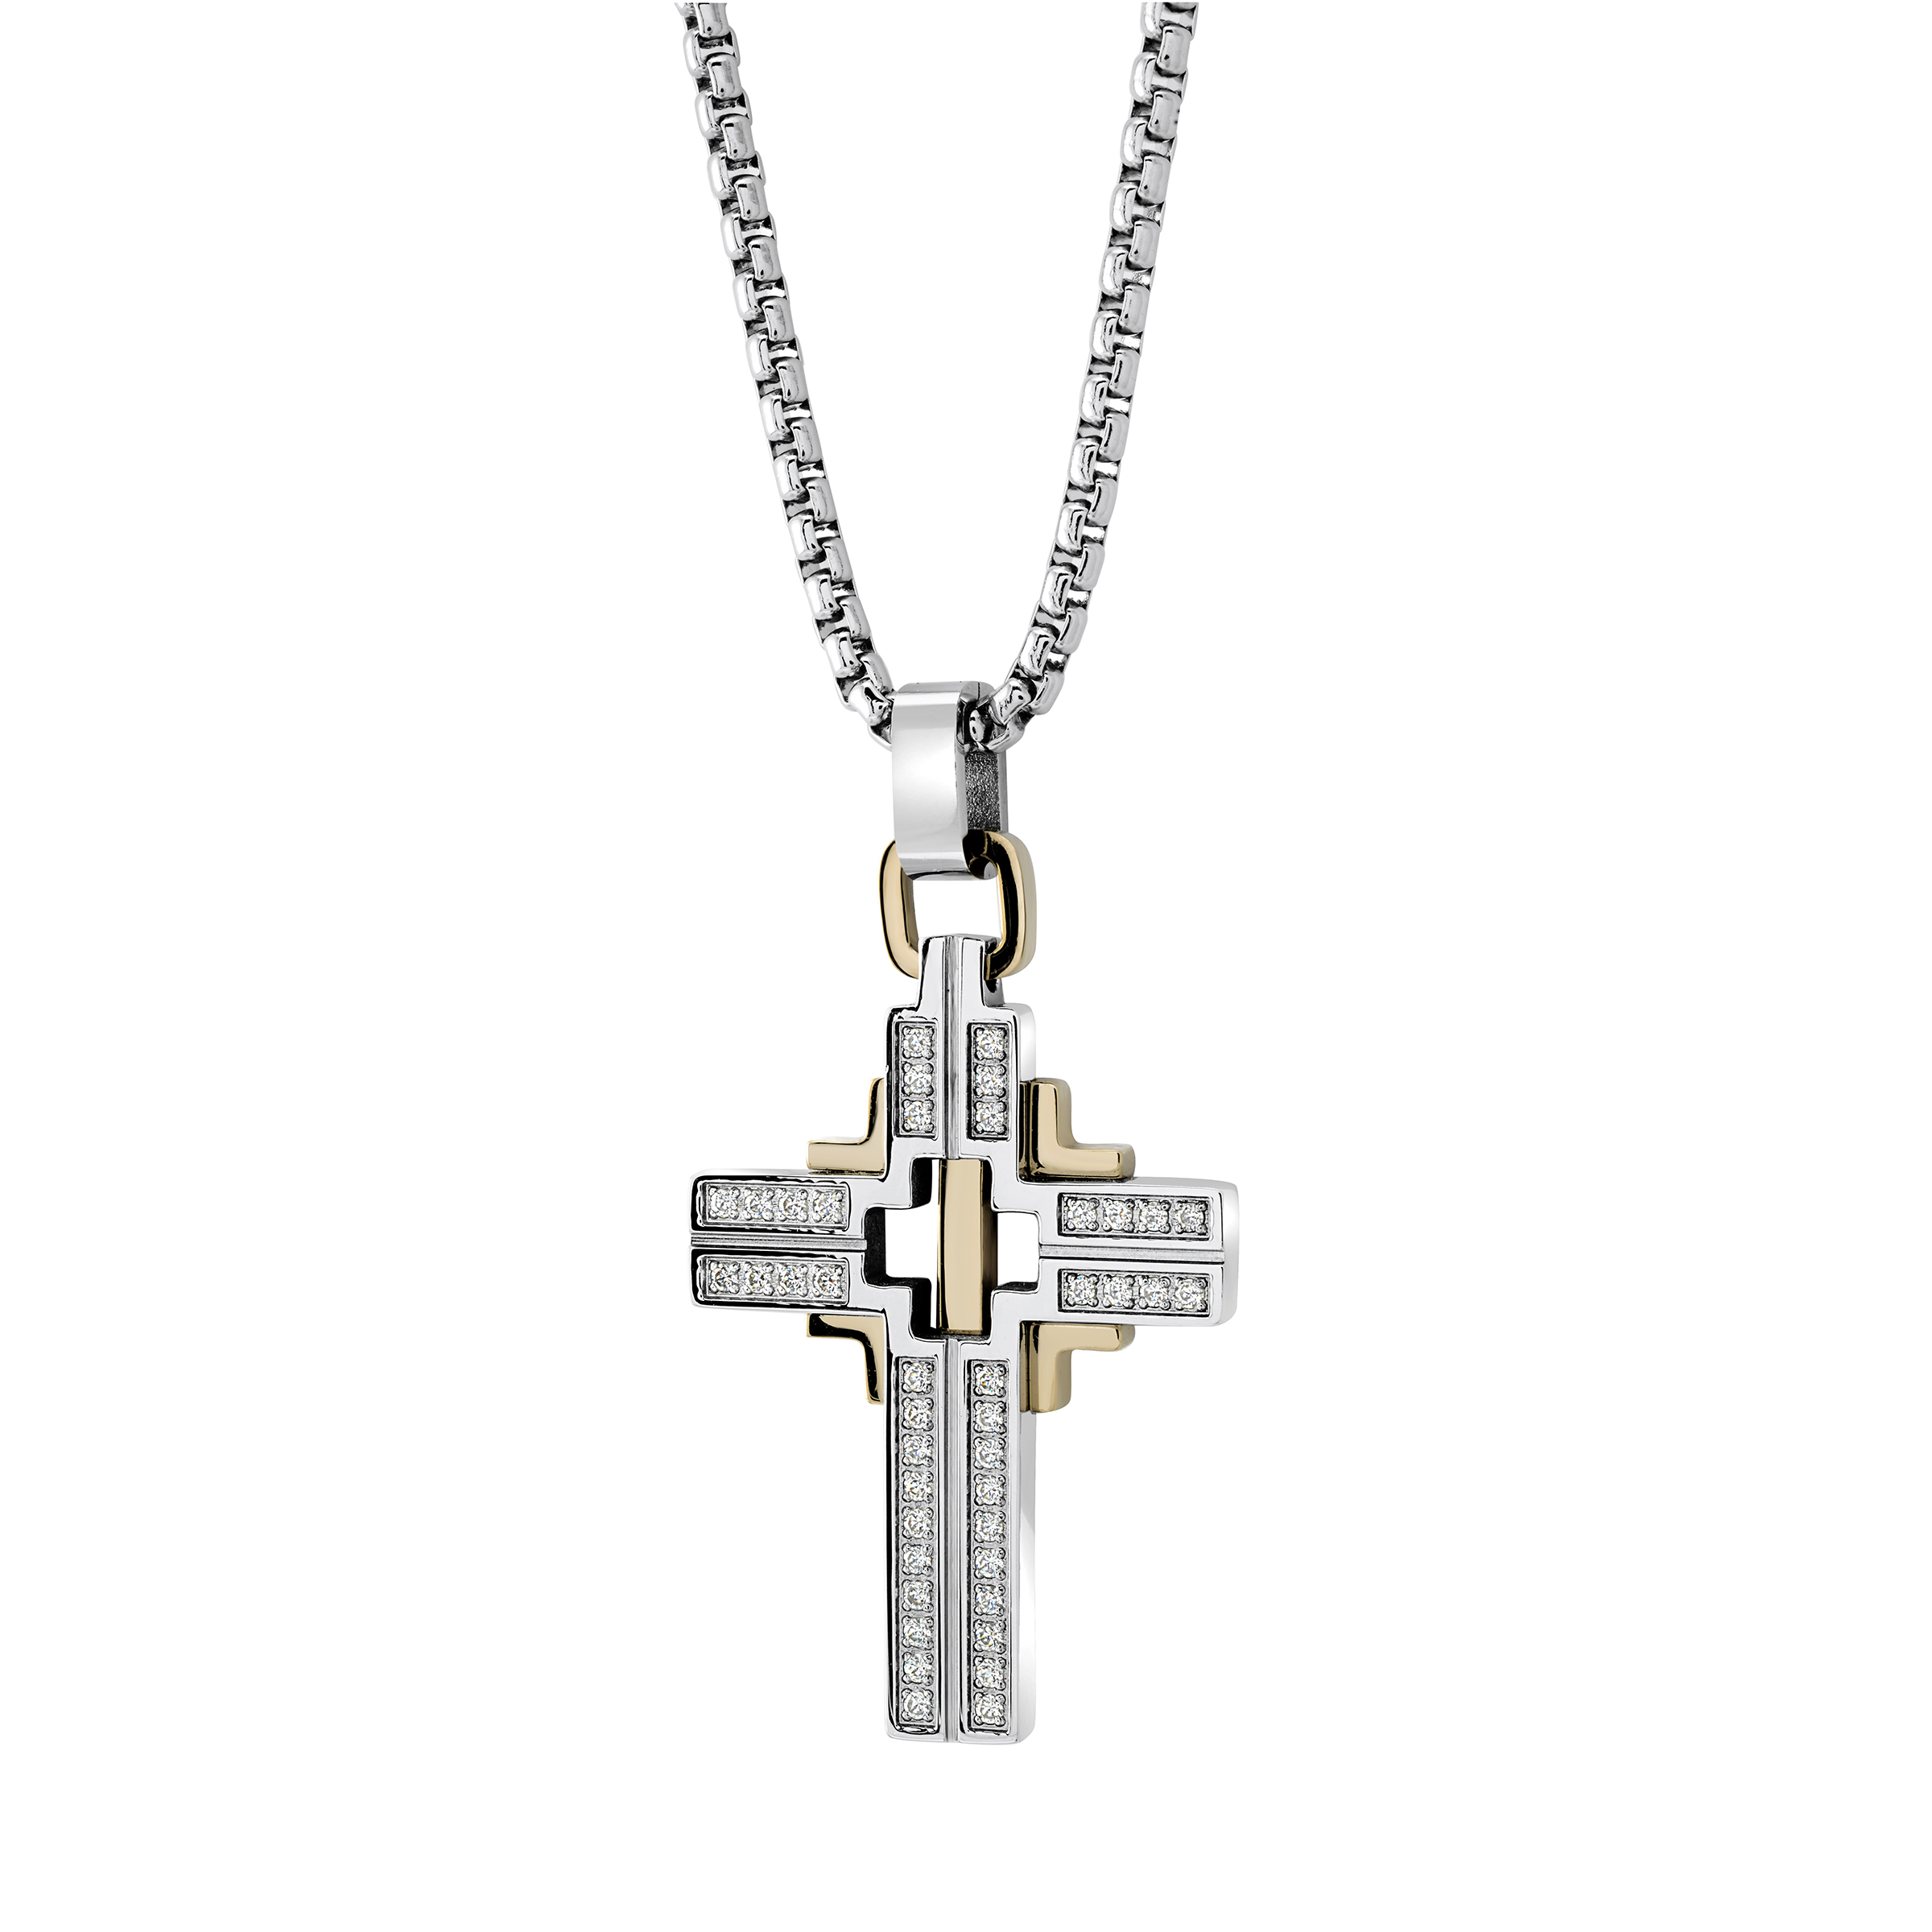 Pendentif croix - Acier inoxydable 2-tons & Zircons cubiques